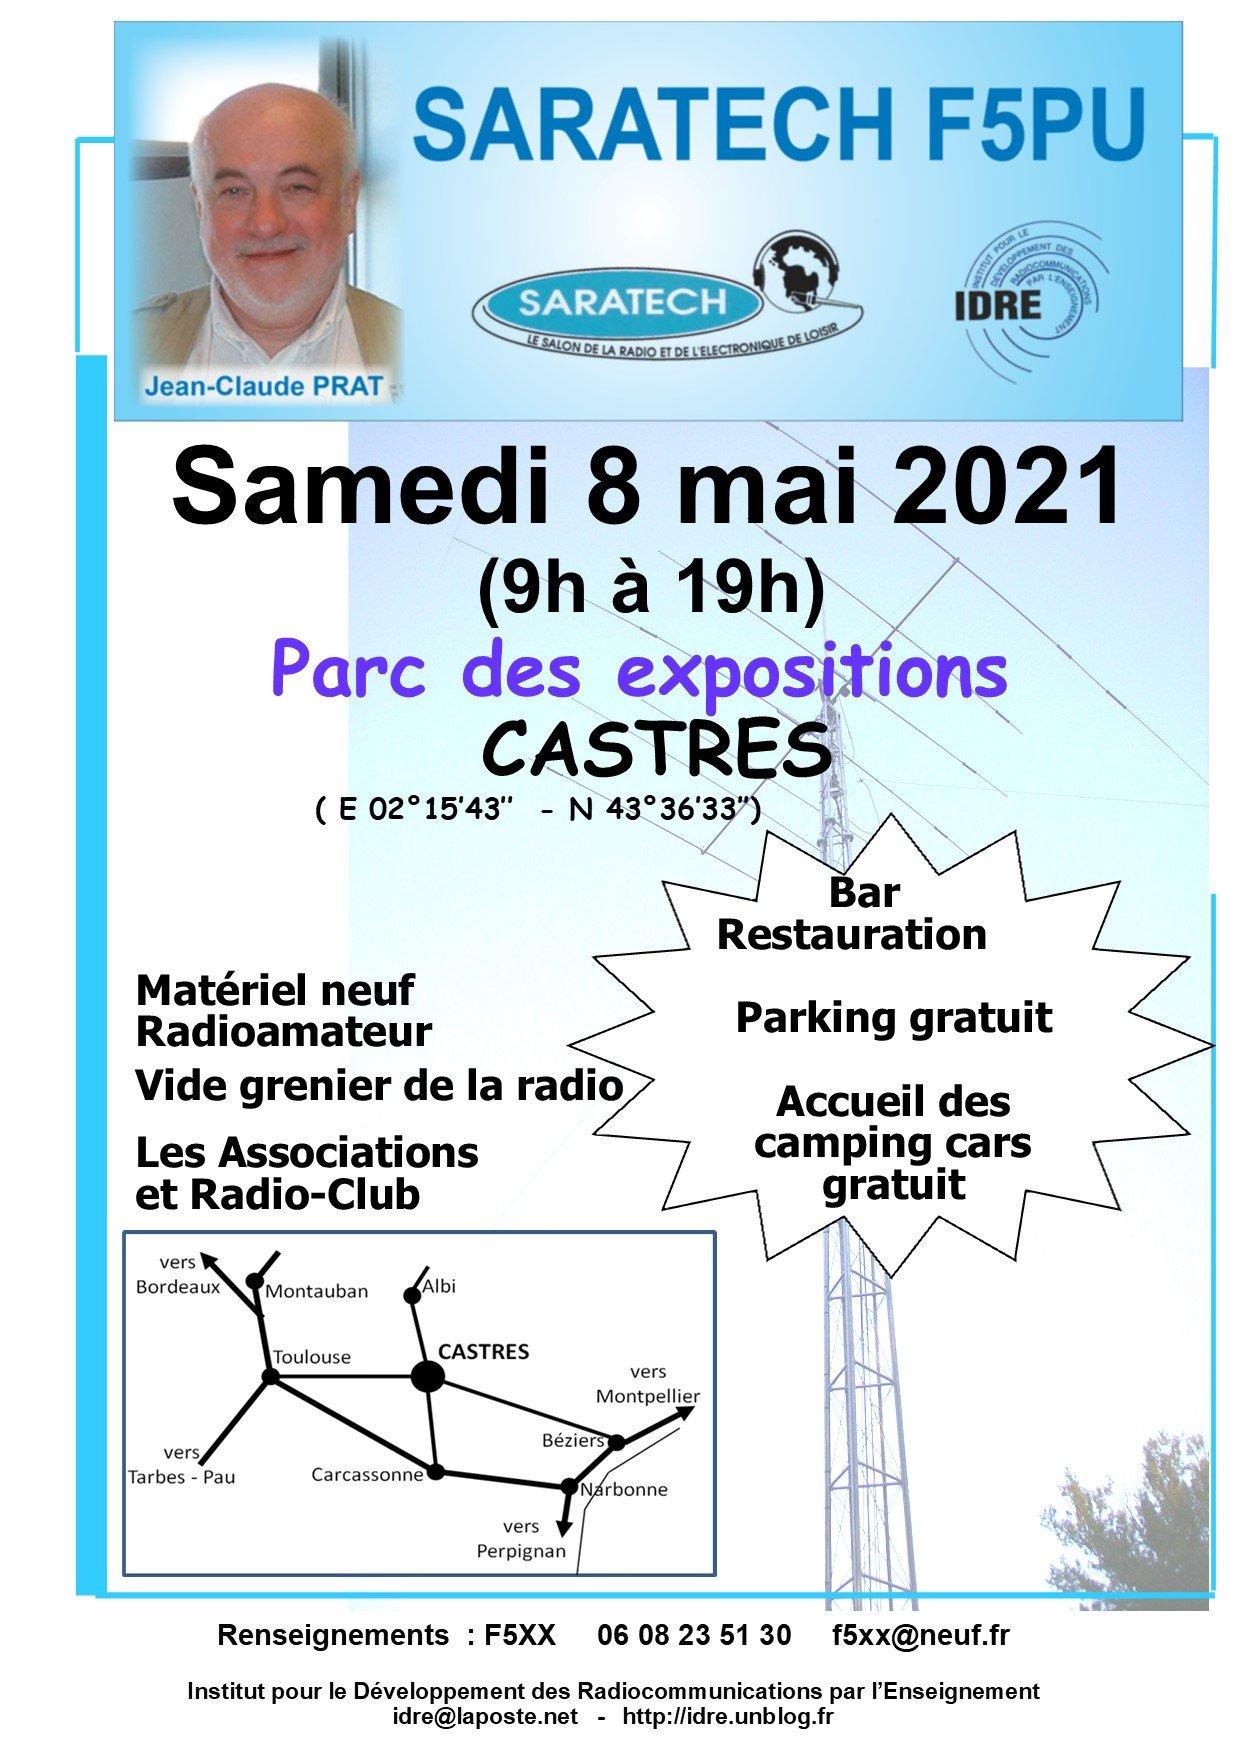 Le Salon Saratech saratech-f5pu-2021_affiche-2